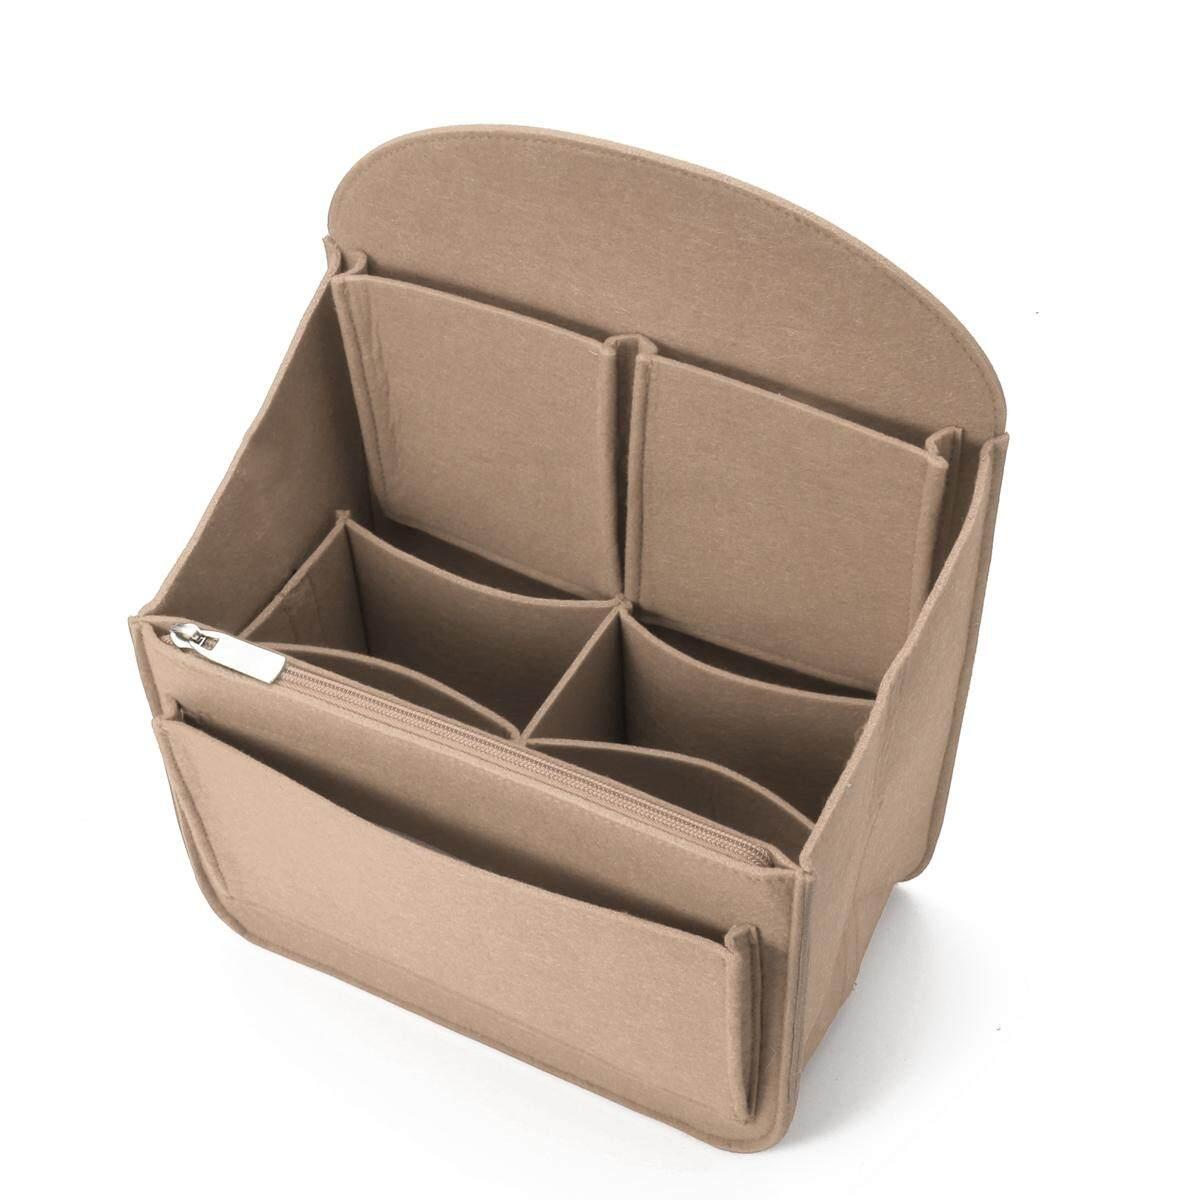 Felt Backpack Organizer Insert Travel Bag Multi Pockets Makeup Round Handbag 27x15x35cm Beige - intl